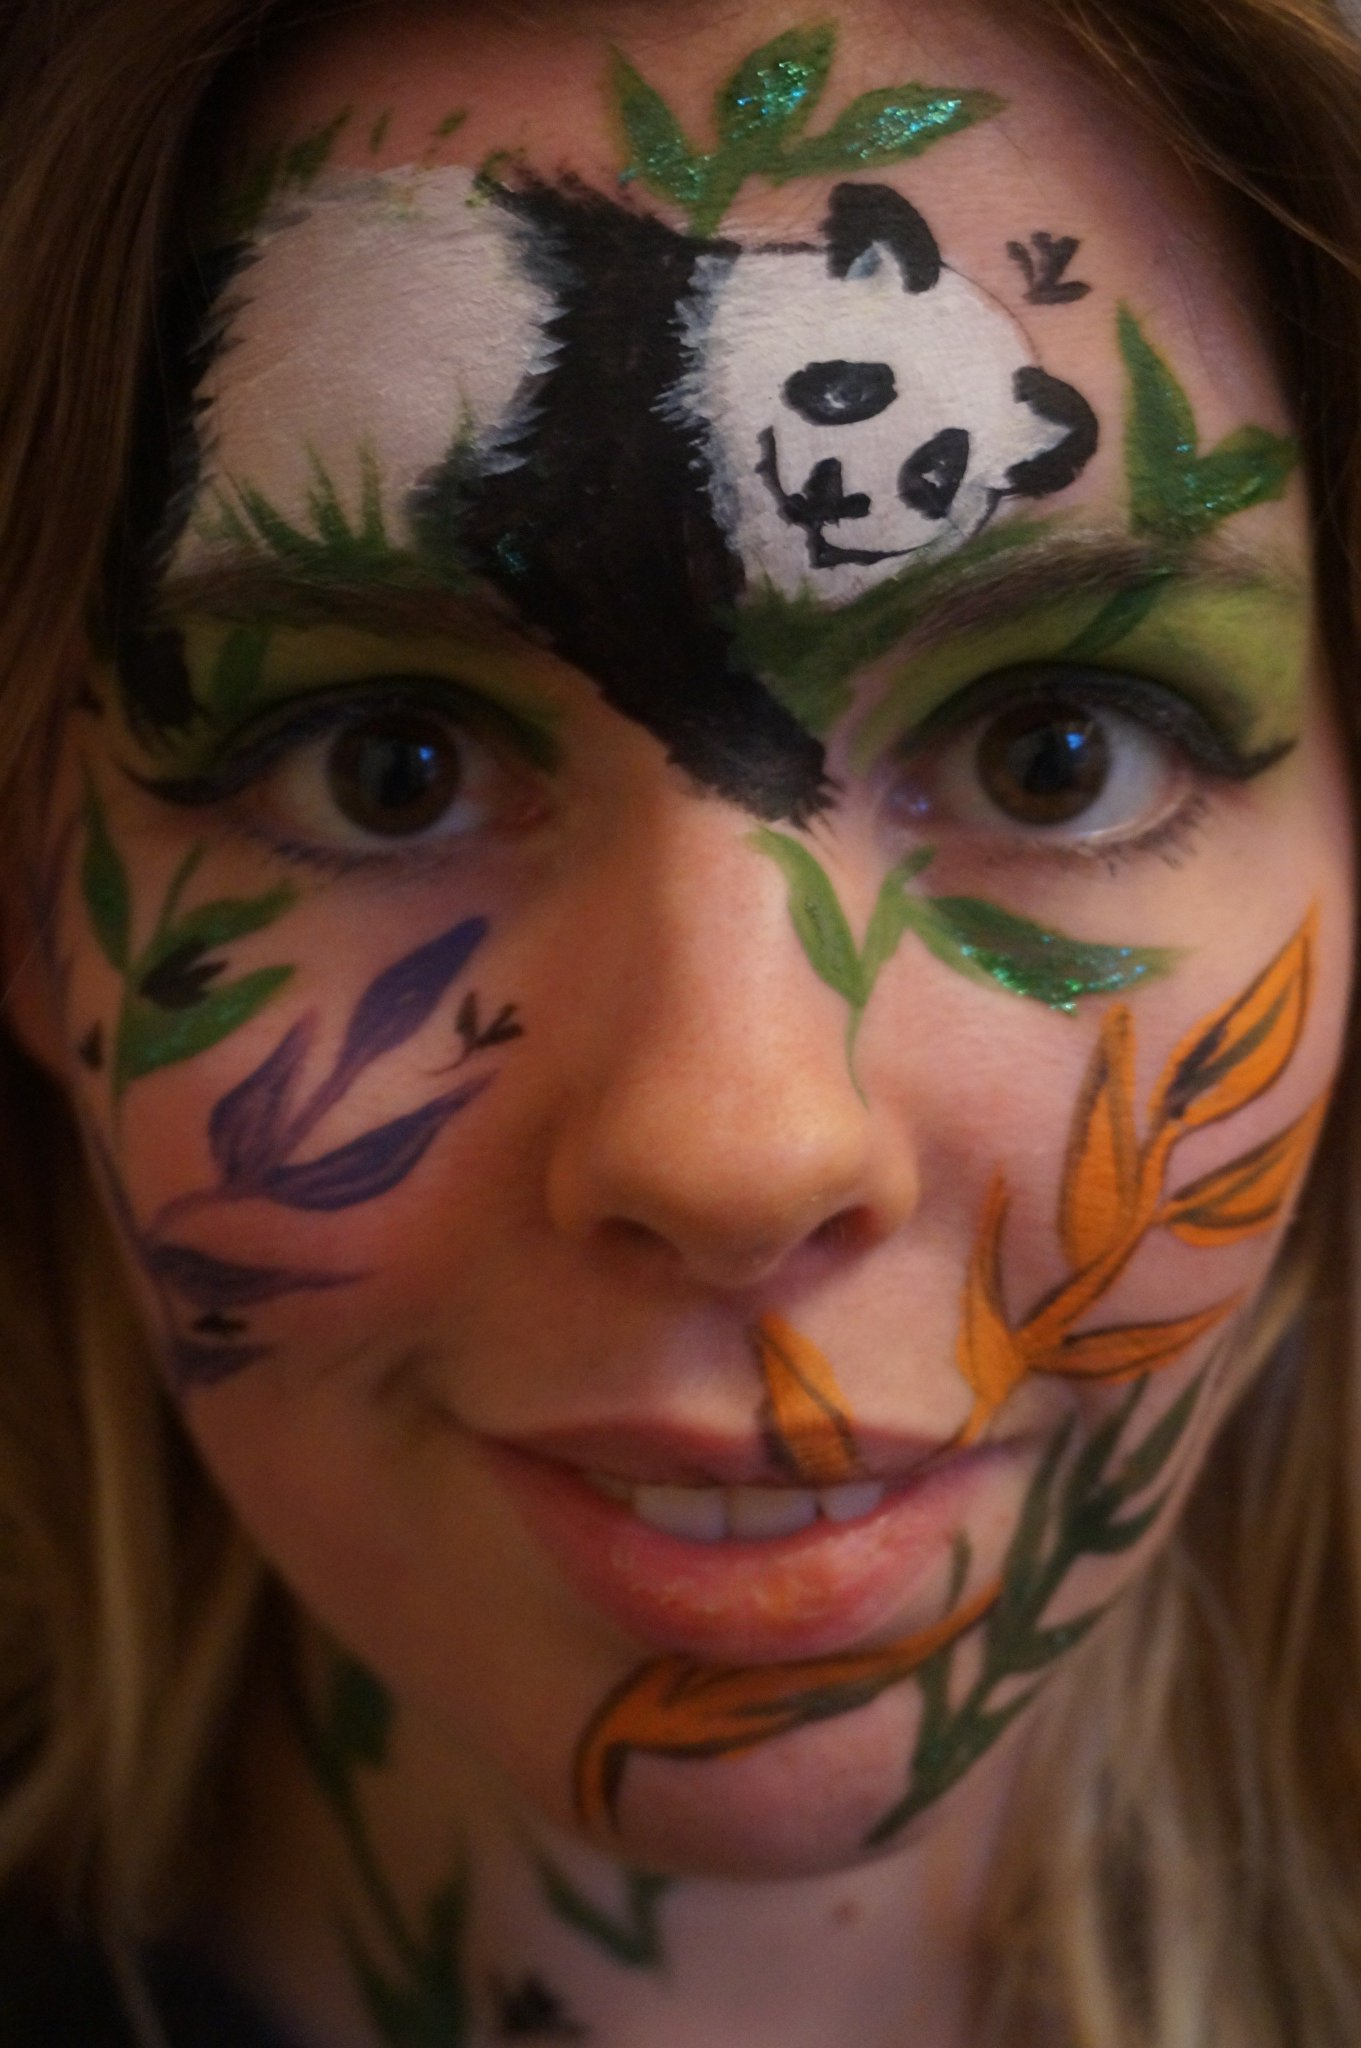 "Rose Weaver on Twitter: ""PANDA! a super cute sleep panda ..."